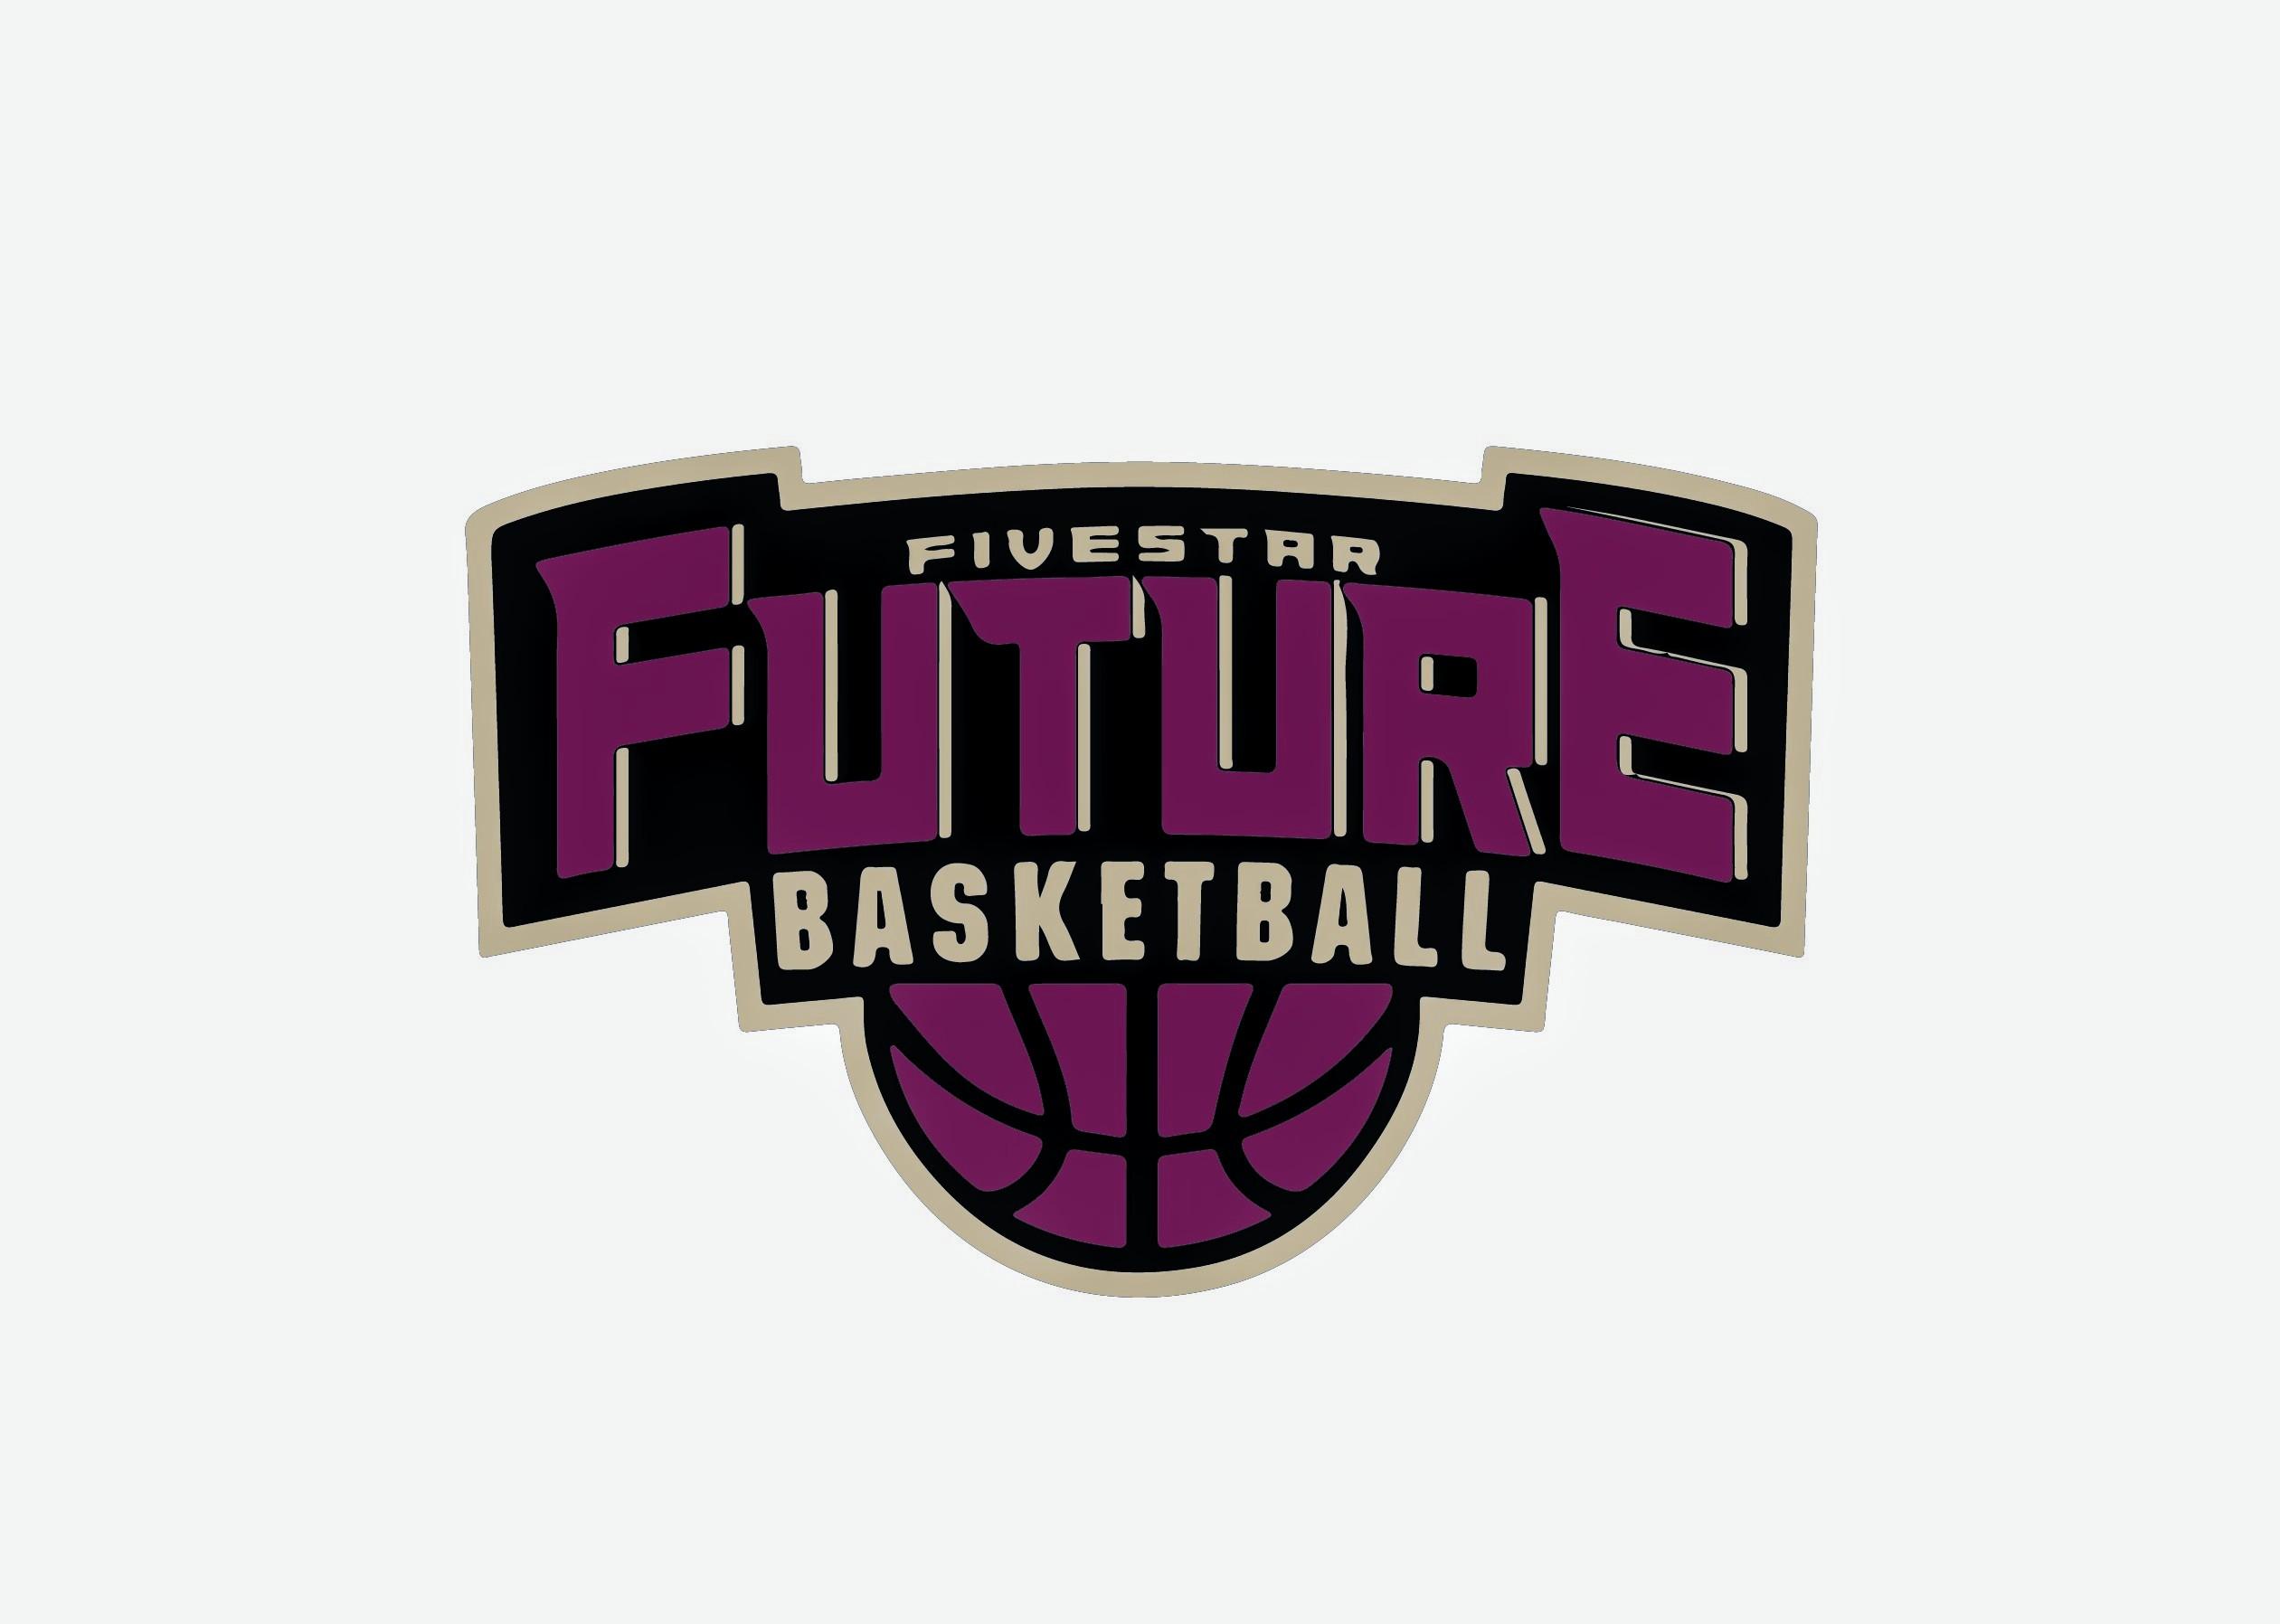 Five Star Future Basketball